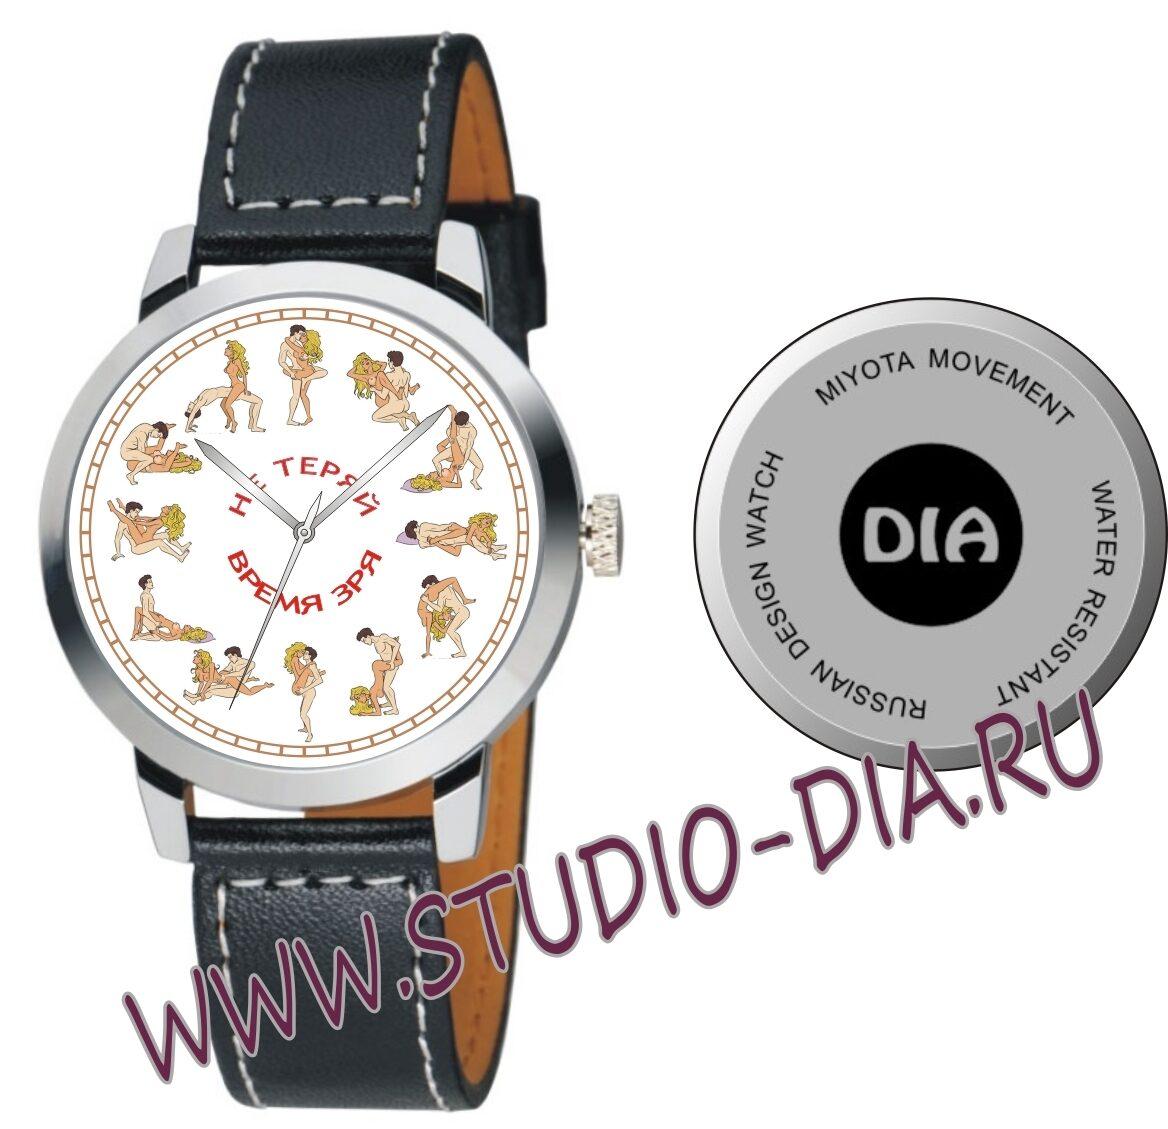 Часы камасутра наручные женские часы ауди купить